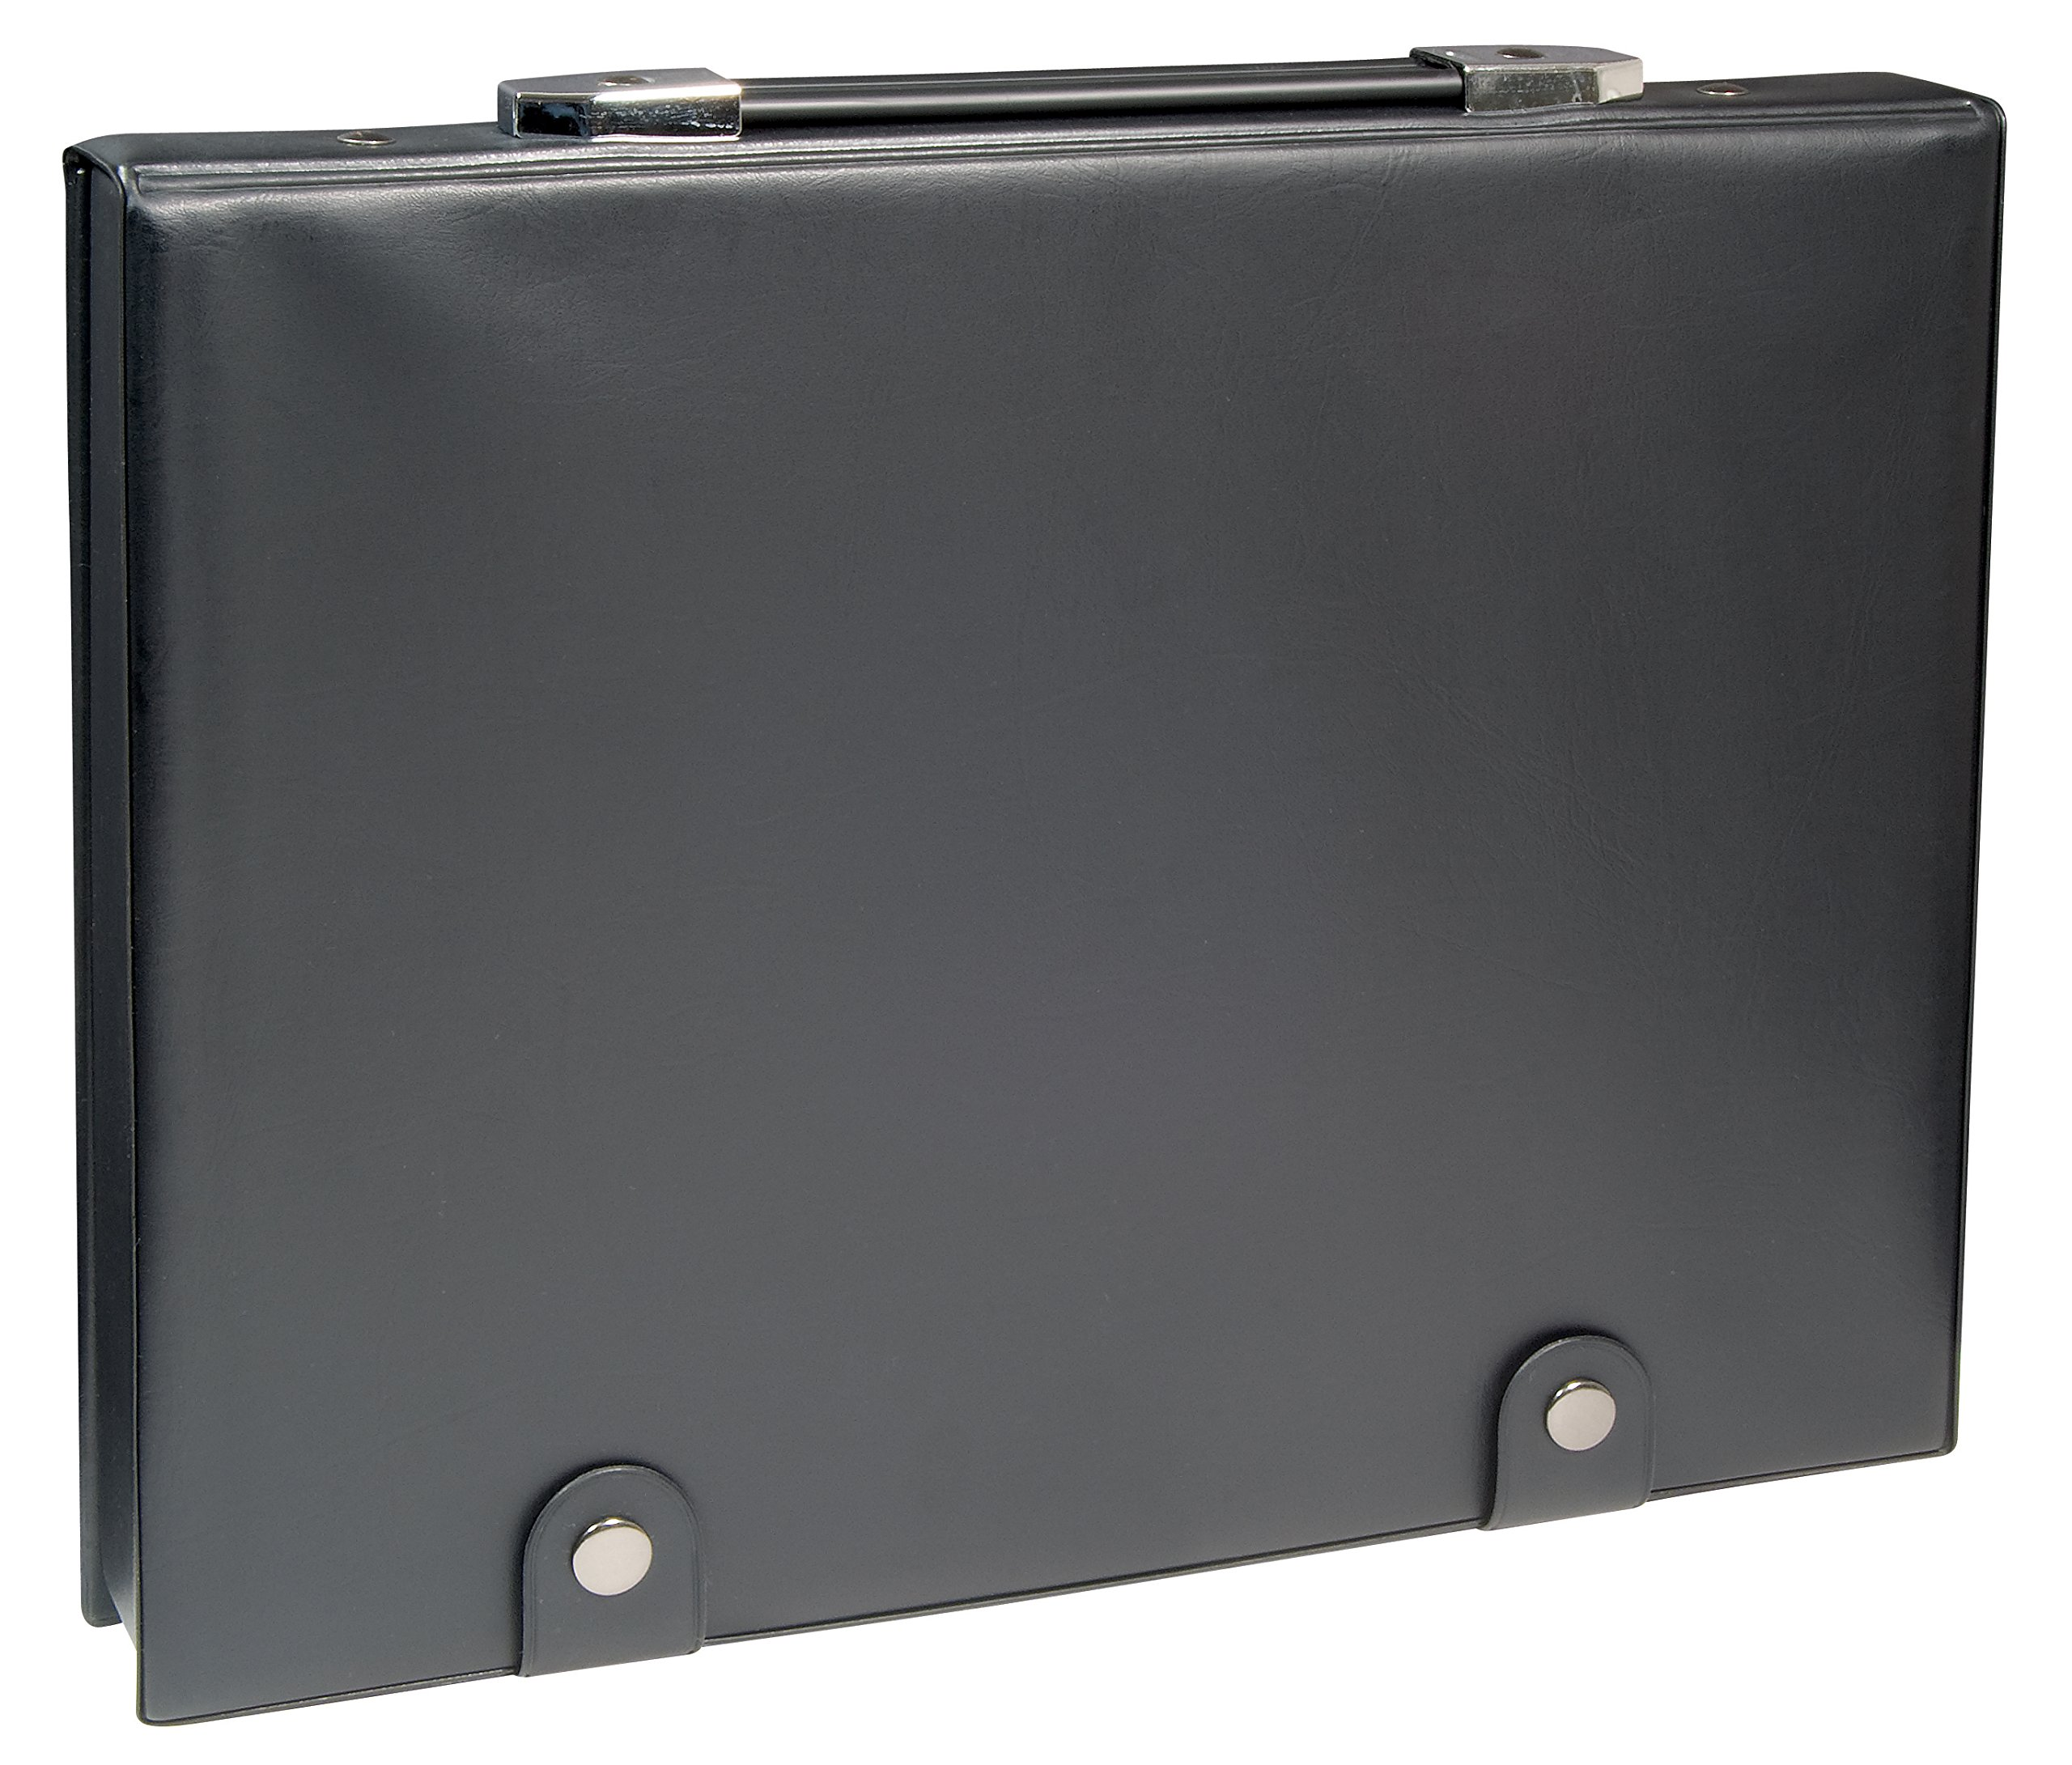 Prestige PC2436 Studio Series Lite Art Portfolio 1-1/2 inch Gusset 24 inches x 36 inches